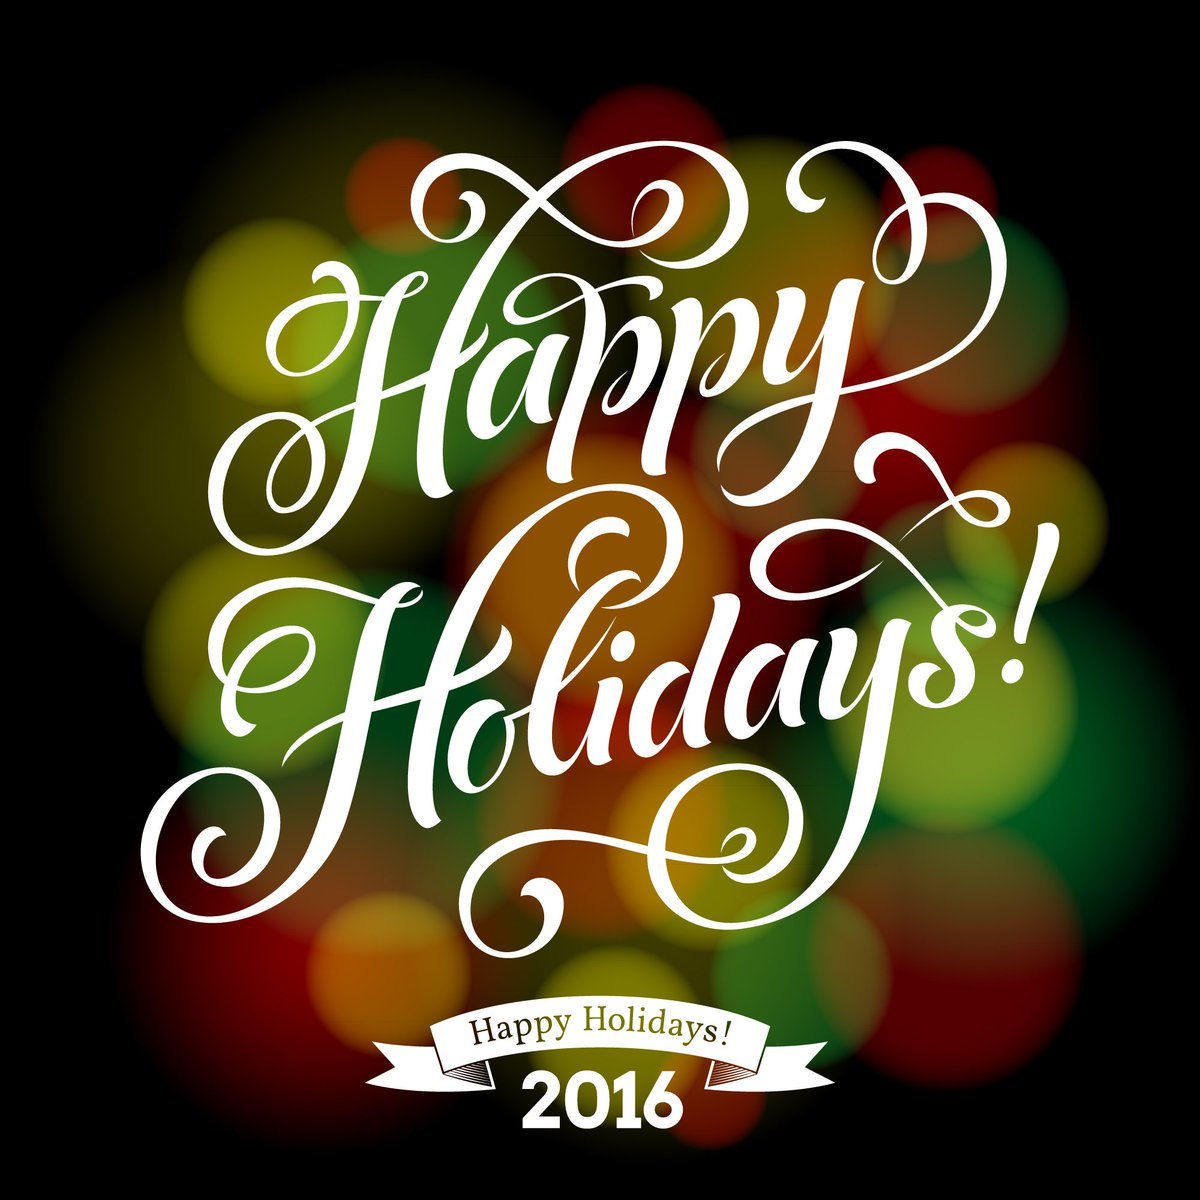 Happy holidays from la chanelphile!